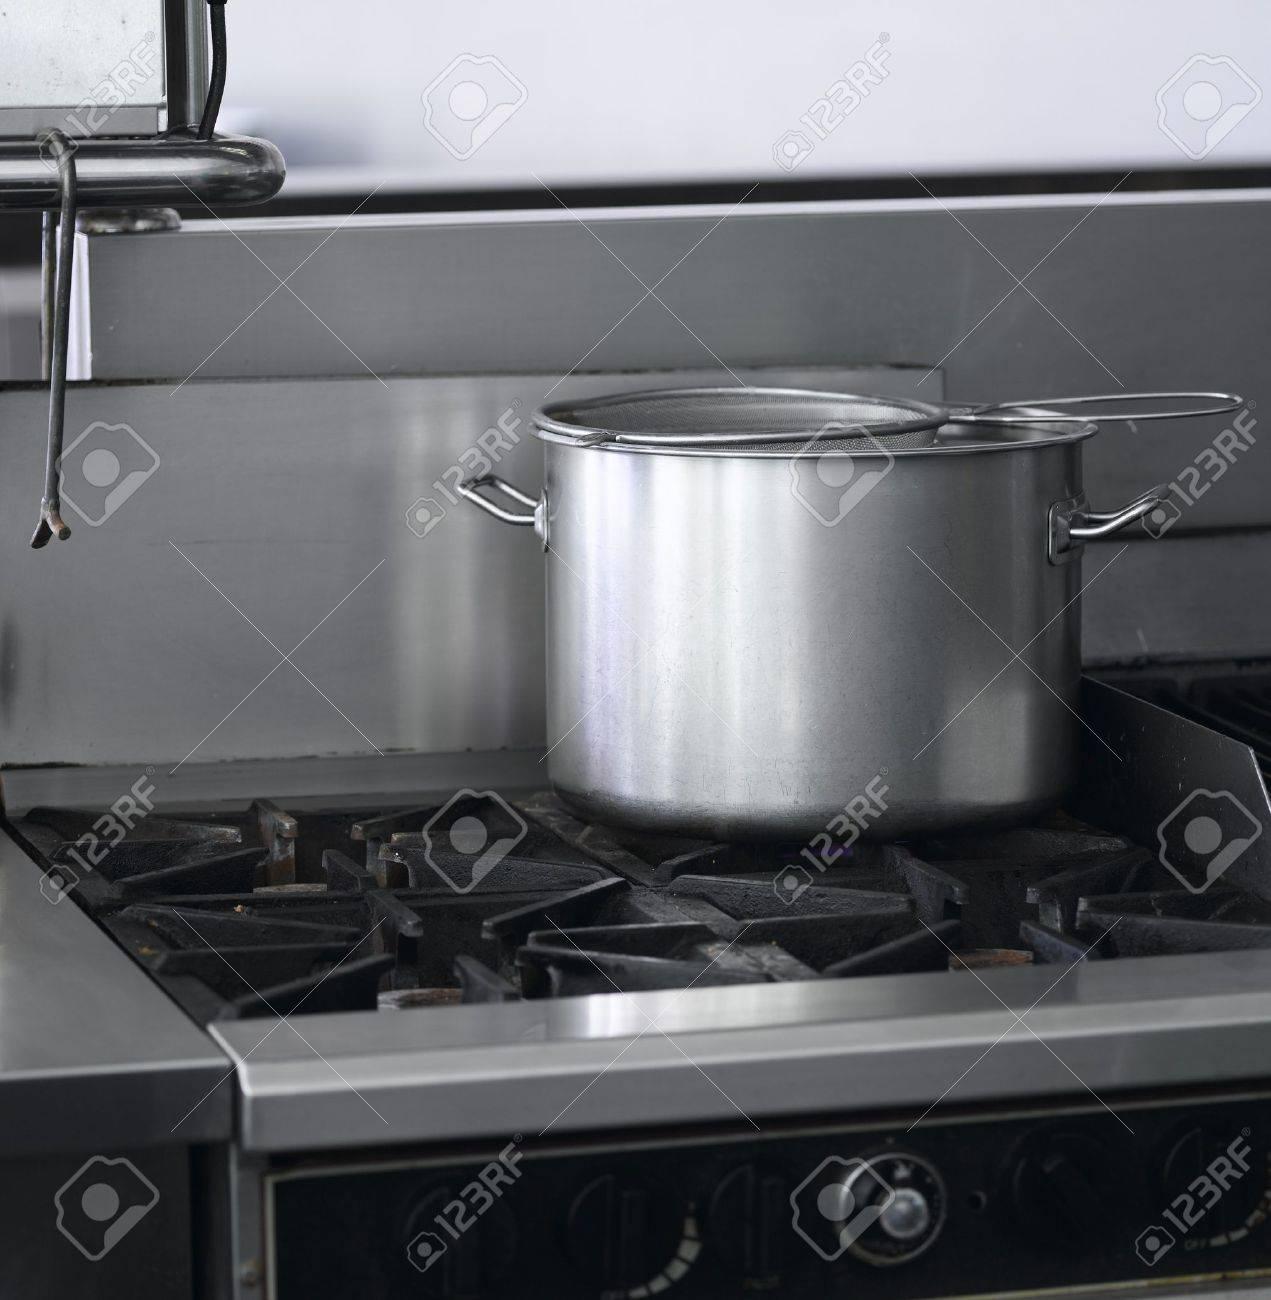 Industrial Cooking Restaurant Kitchen Equipment Stock Photo, Picture ...